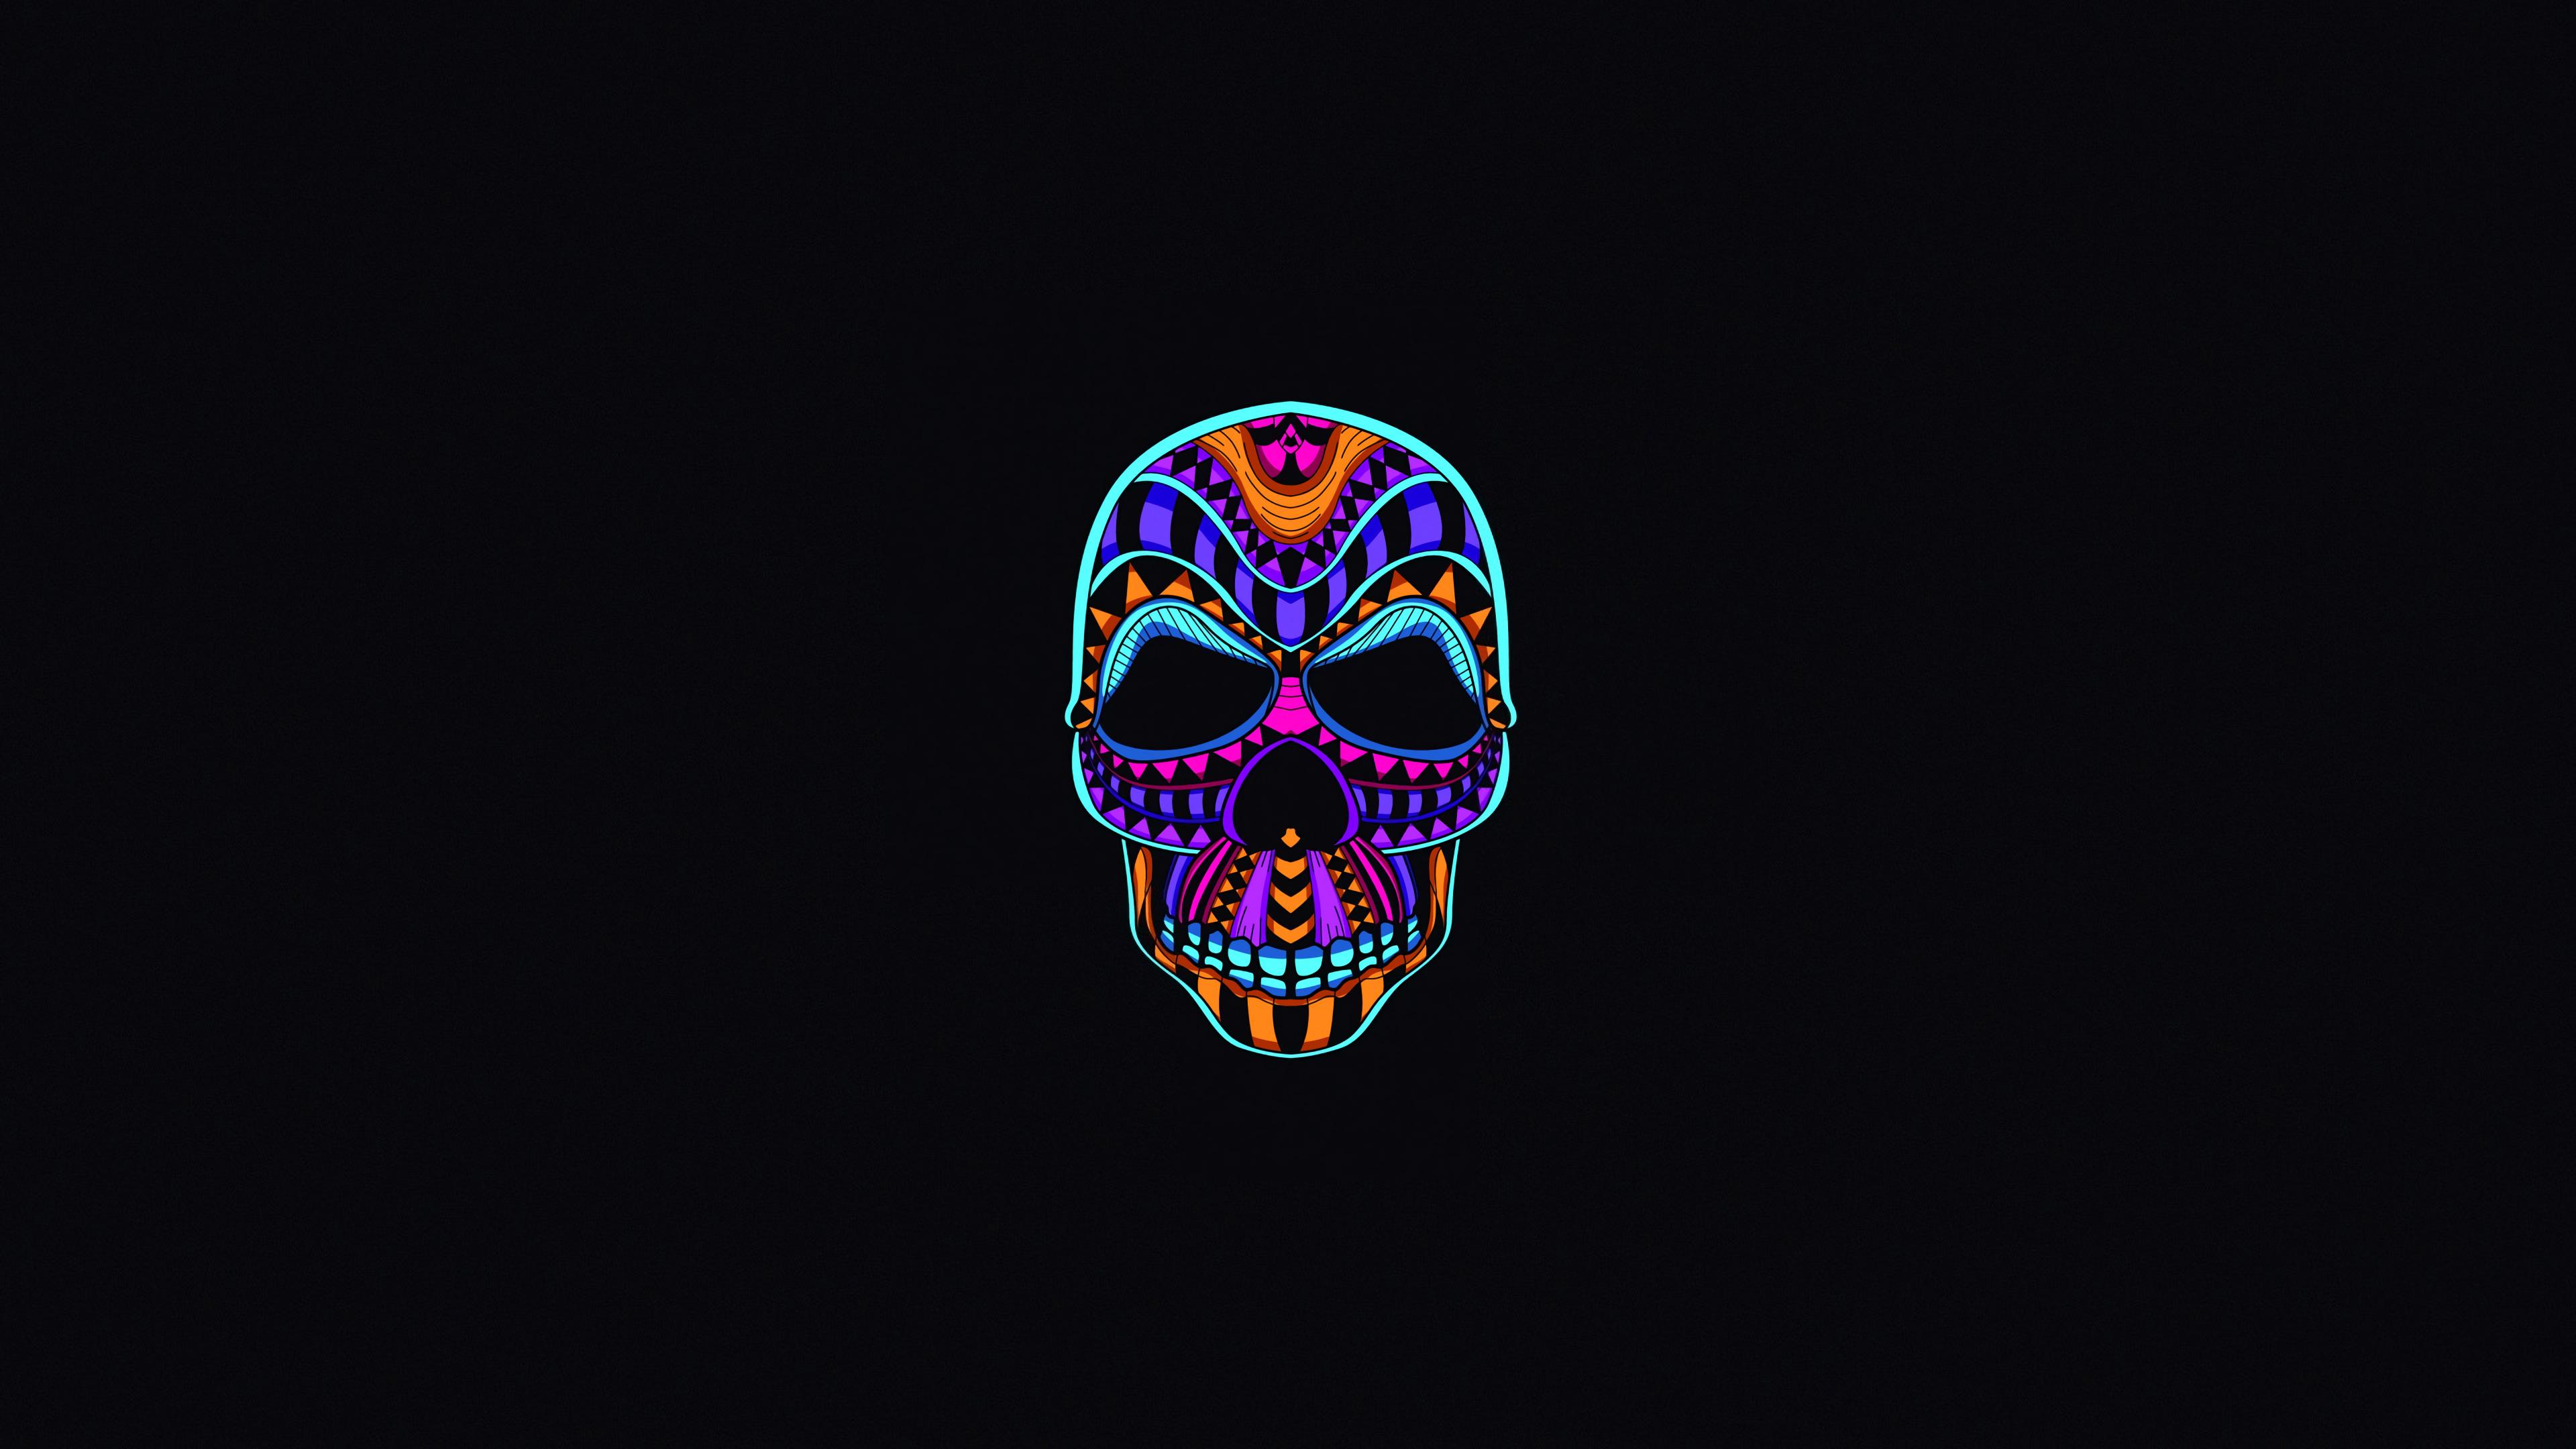 Skull Dark Minimal 4k Hd Movies 4k Wallpapers Images